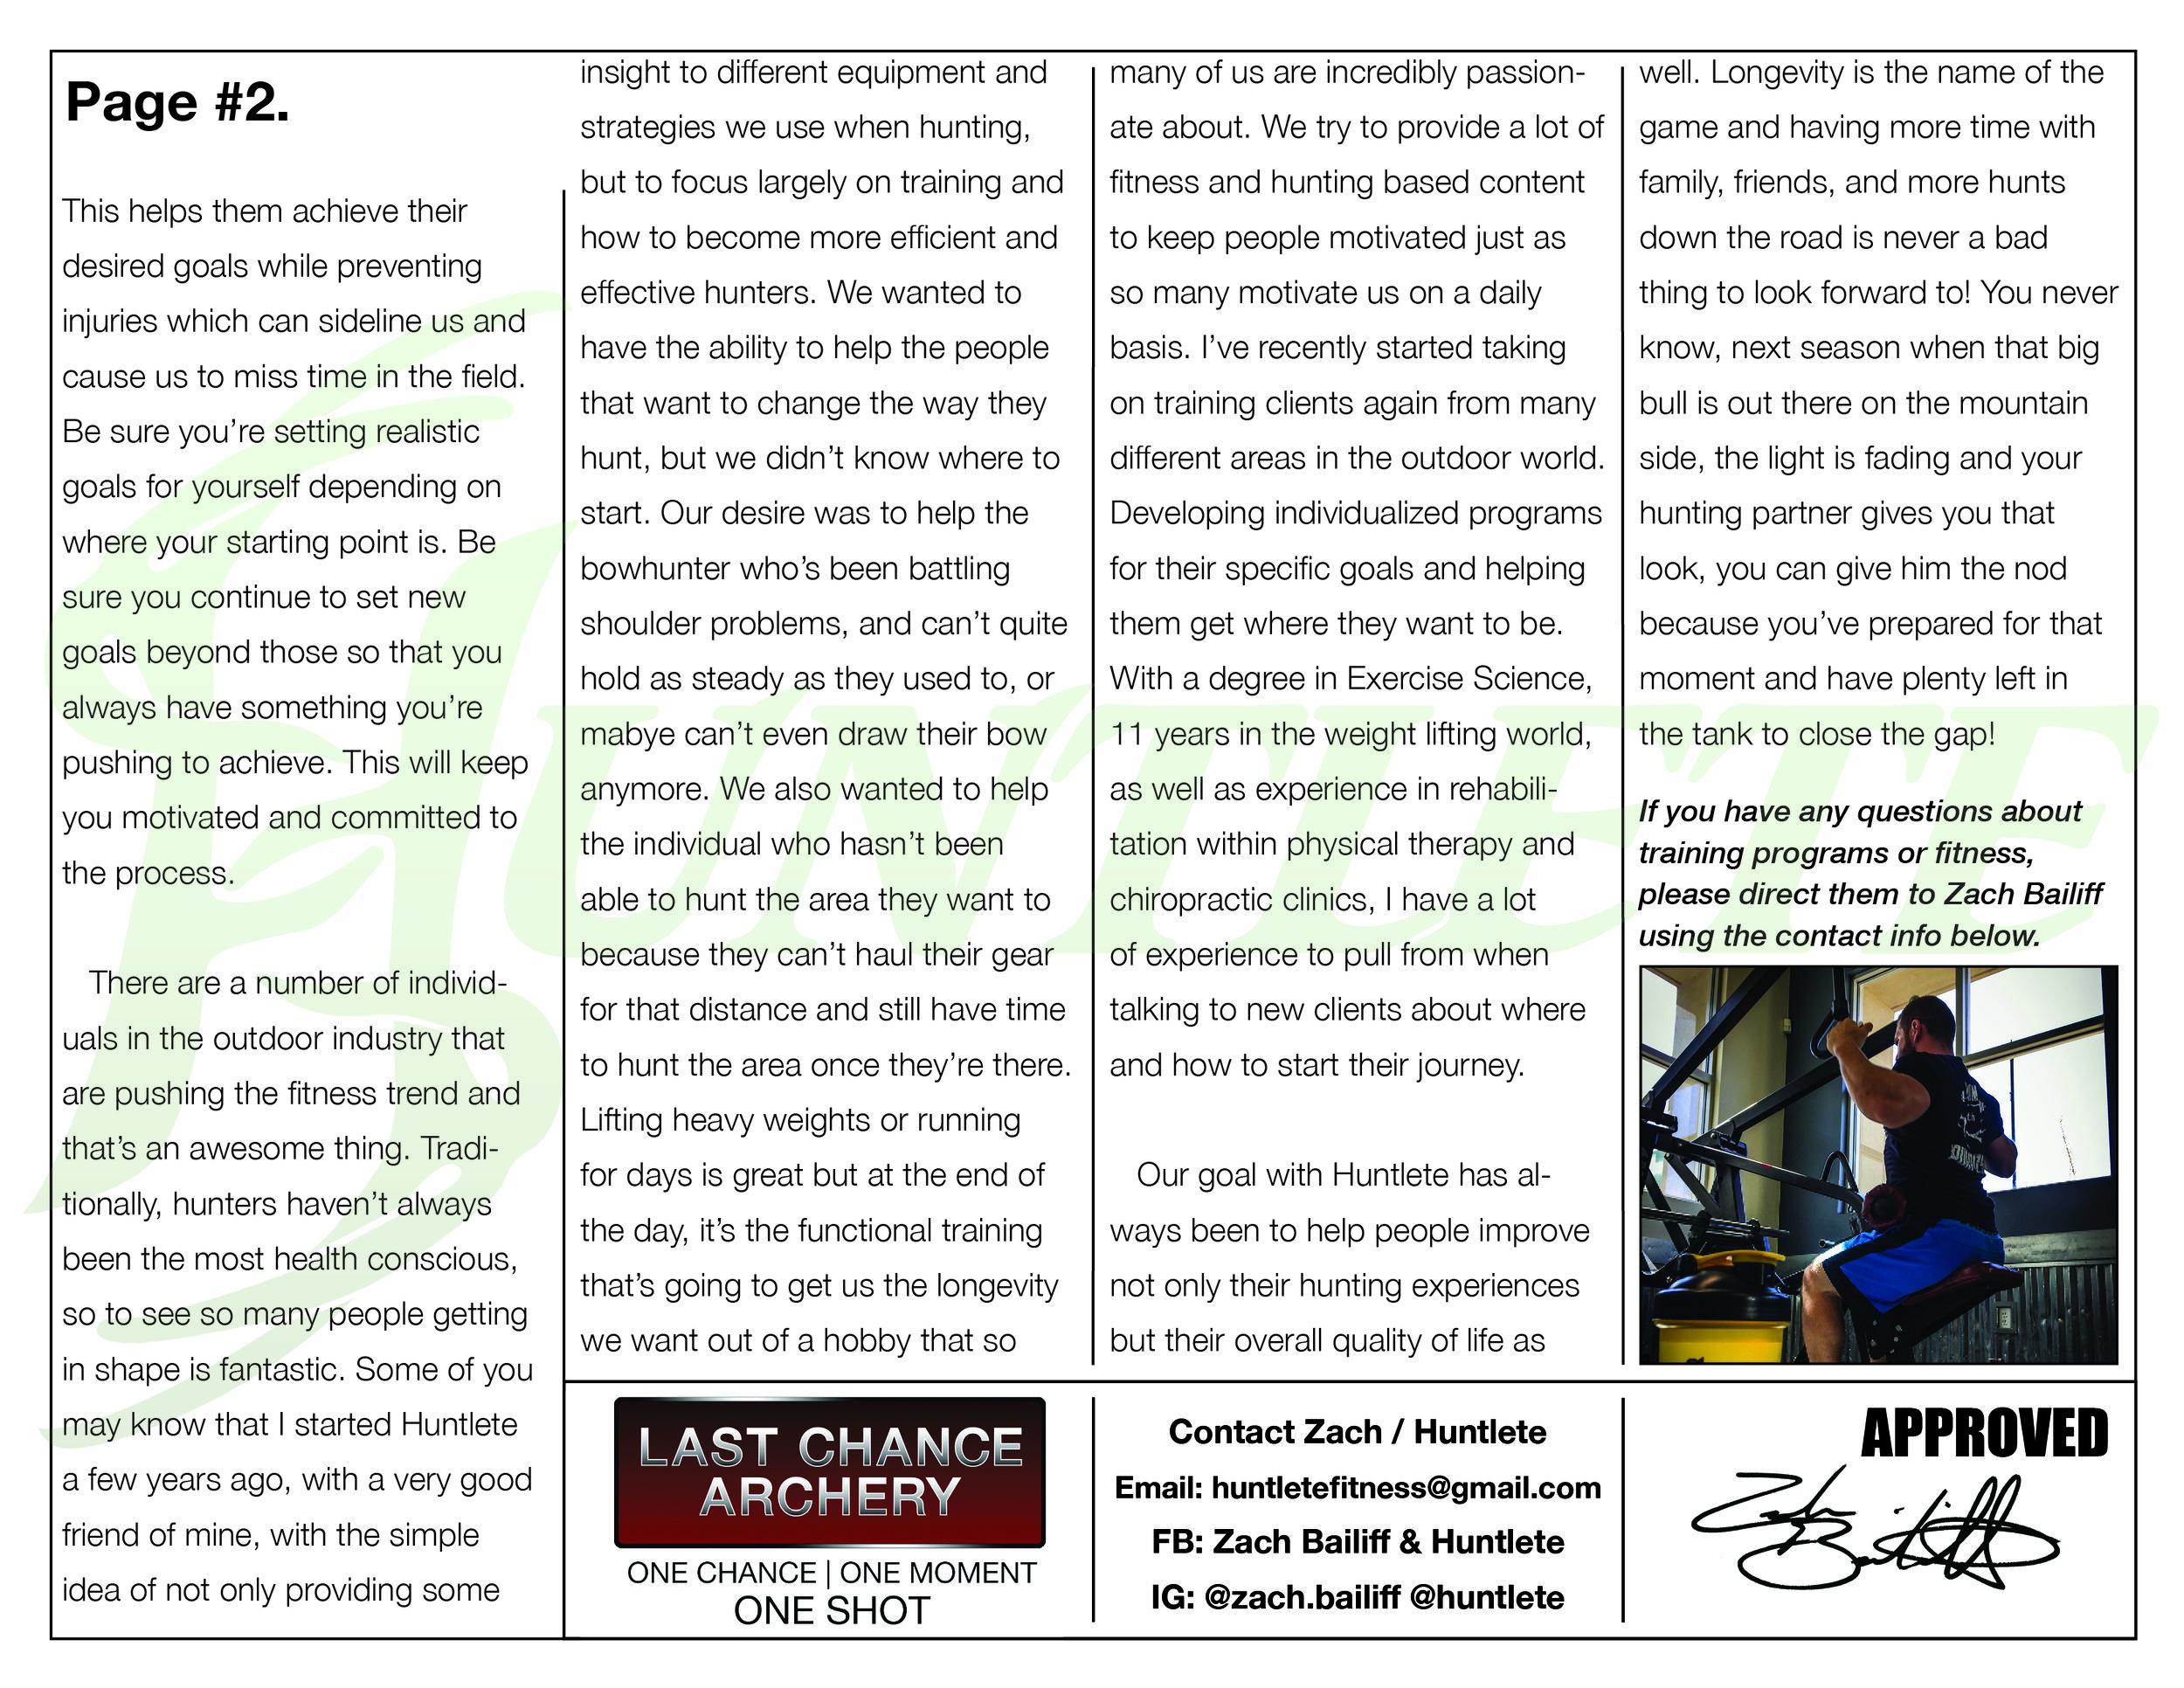 Zach Bailiff Article September 2017 2.jpg